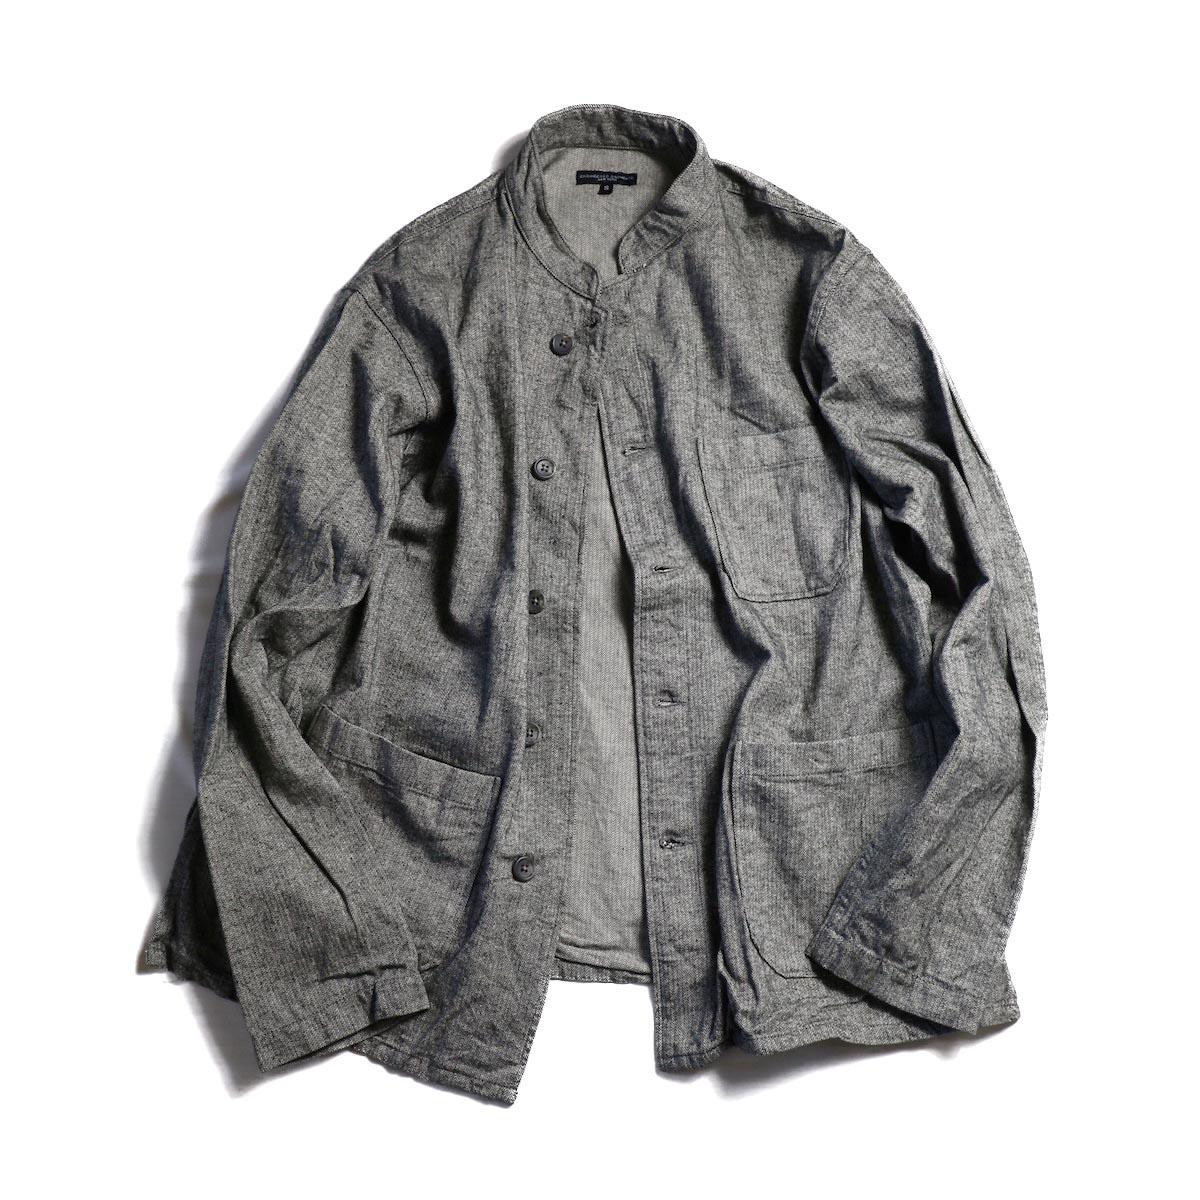 Engineered Garments / Dayton Shirt - Brushed HB